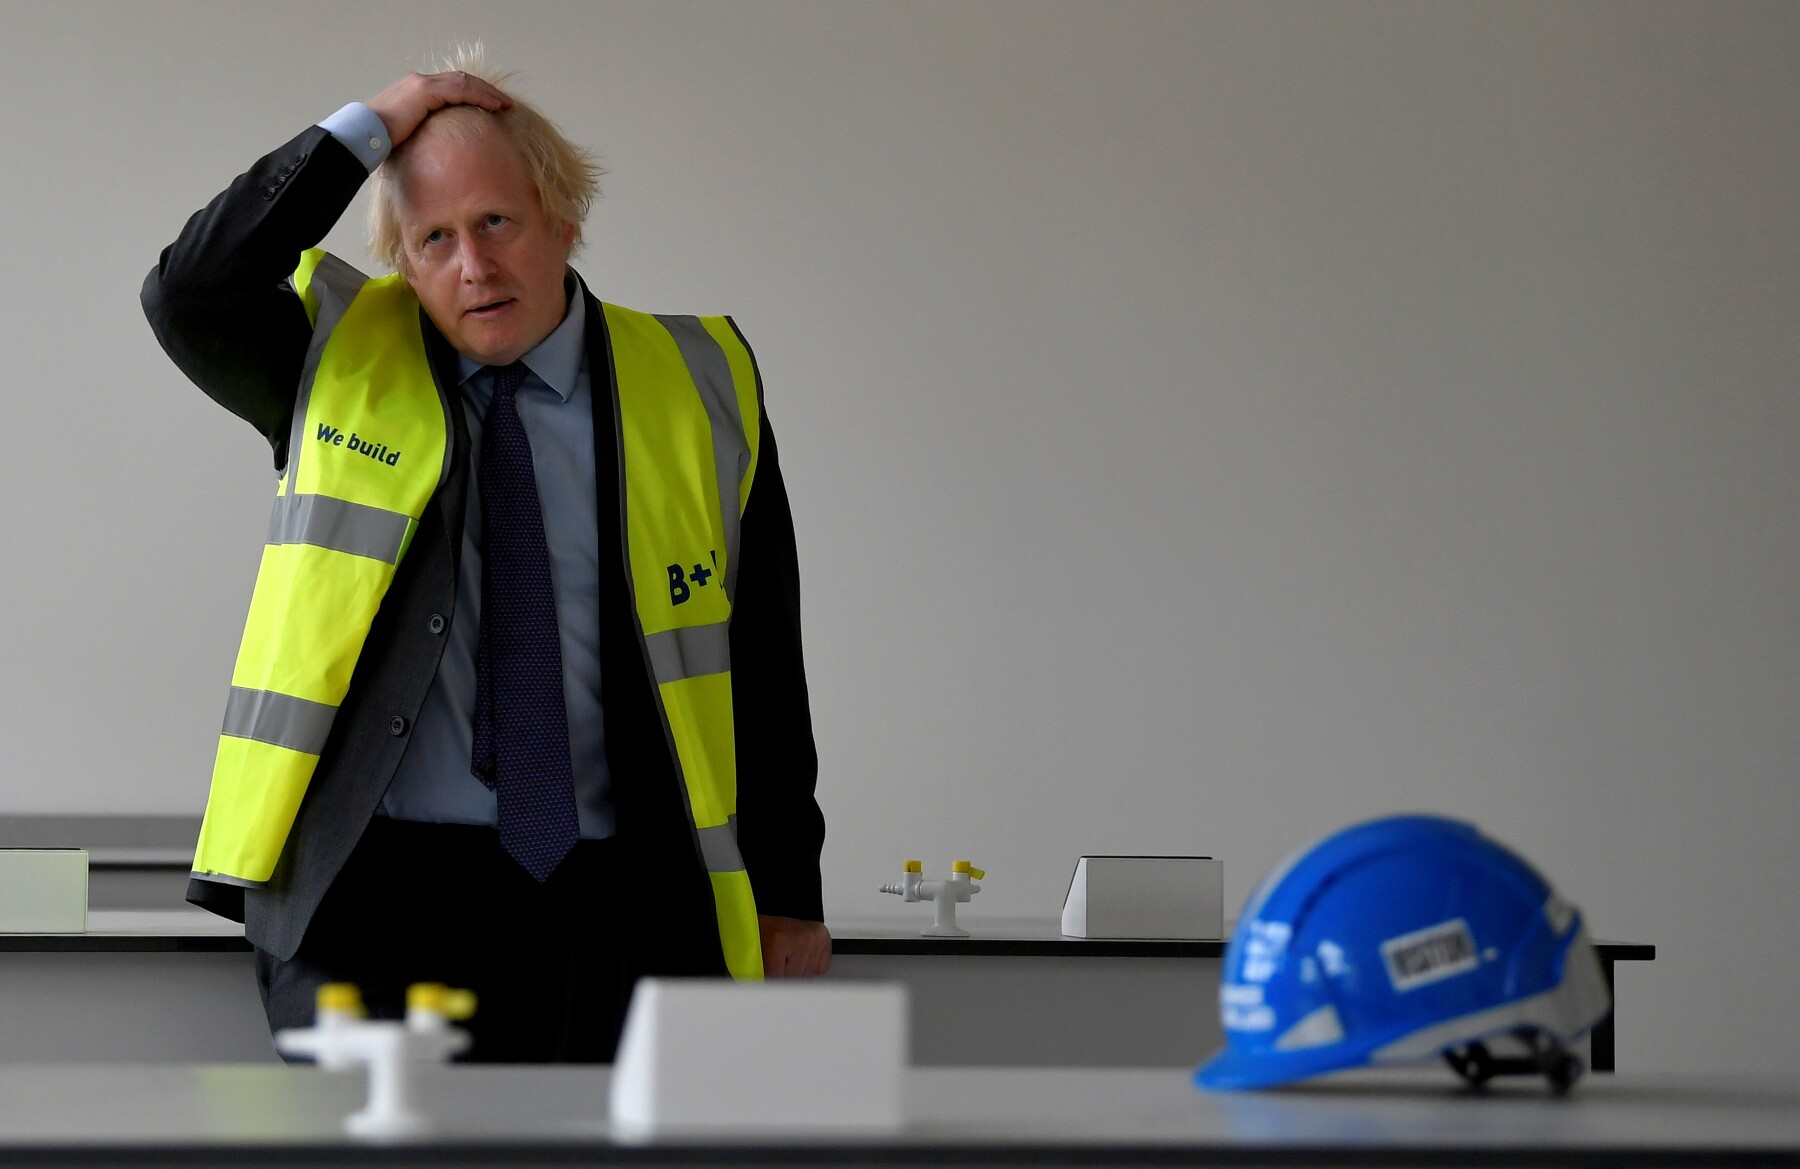 BRITAIN-POLITICS-EDUCATION-CONSTRUCTION